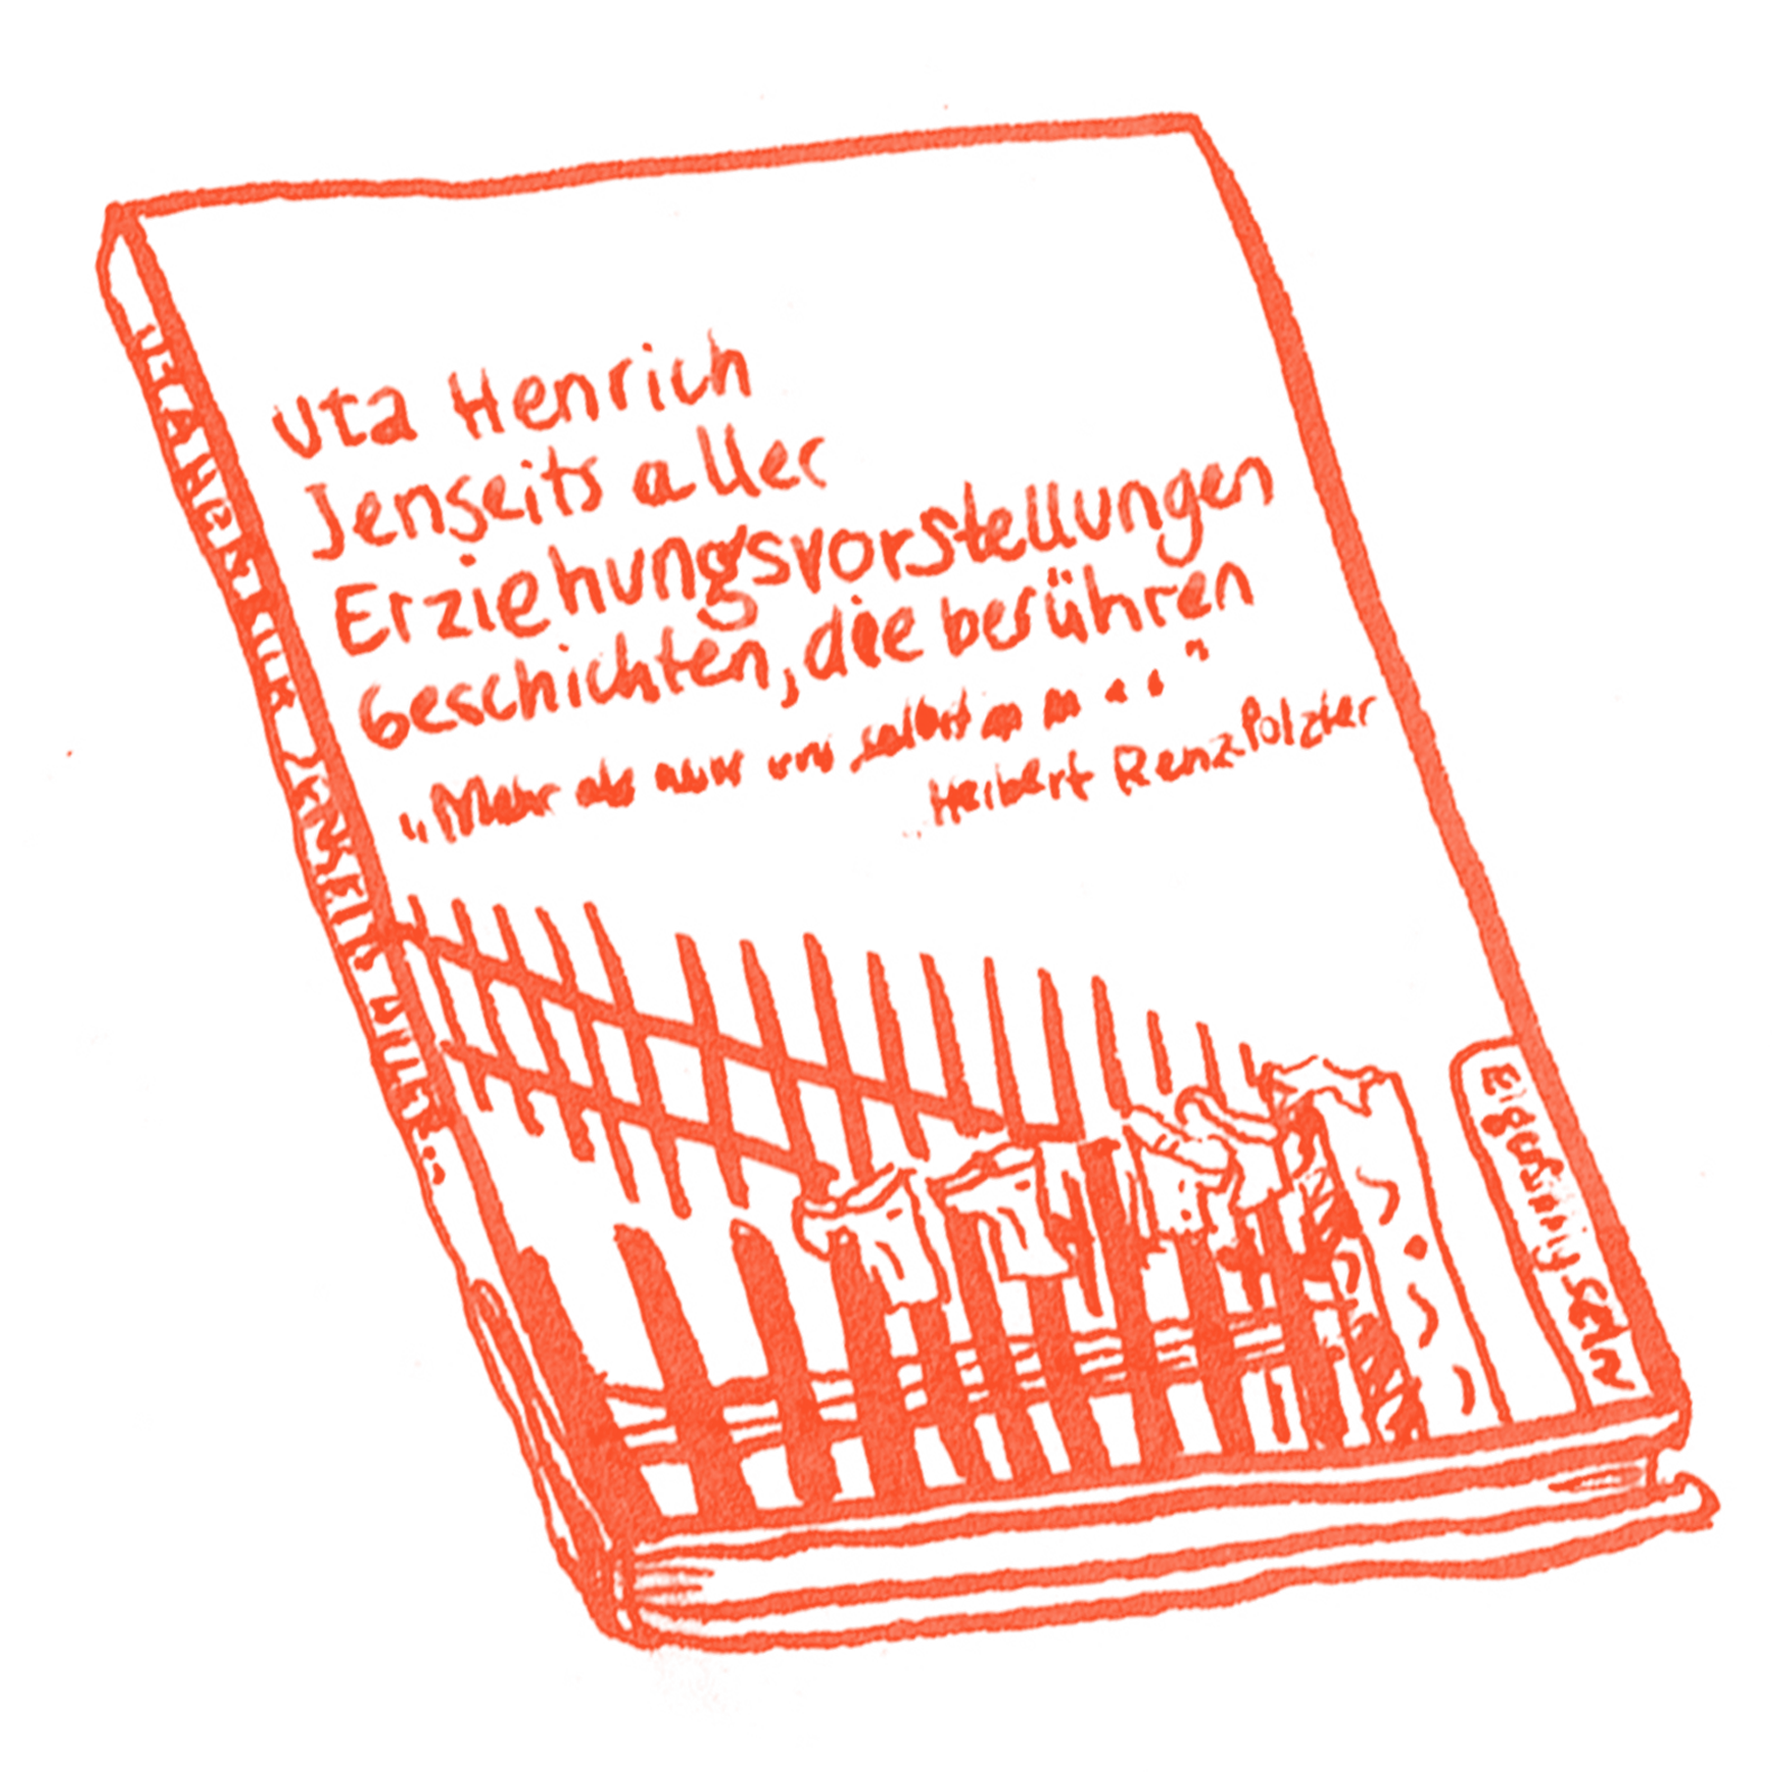 A quick sketch of Uta Henrich's book: Jenseits aller Erziehungsvorstellungen | By Ida Henrich